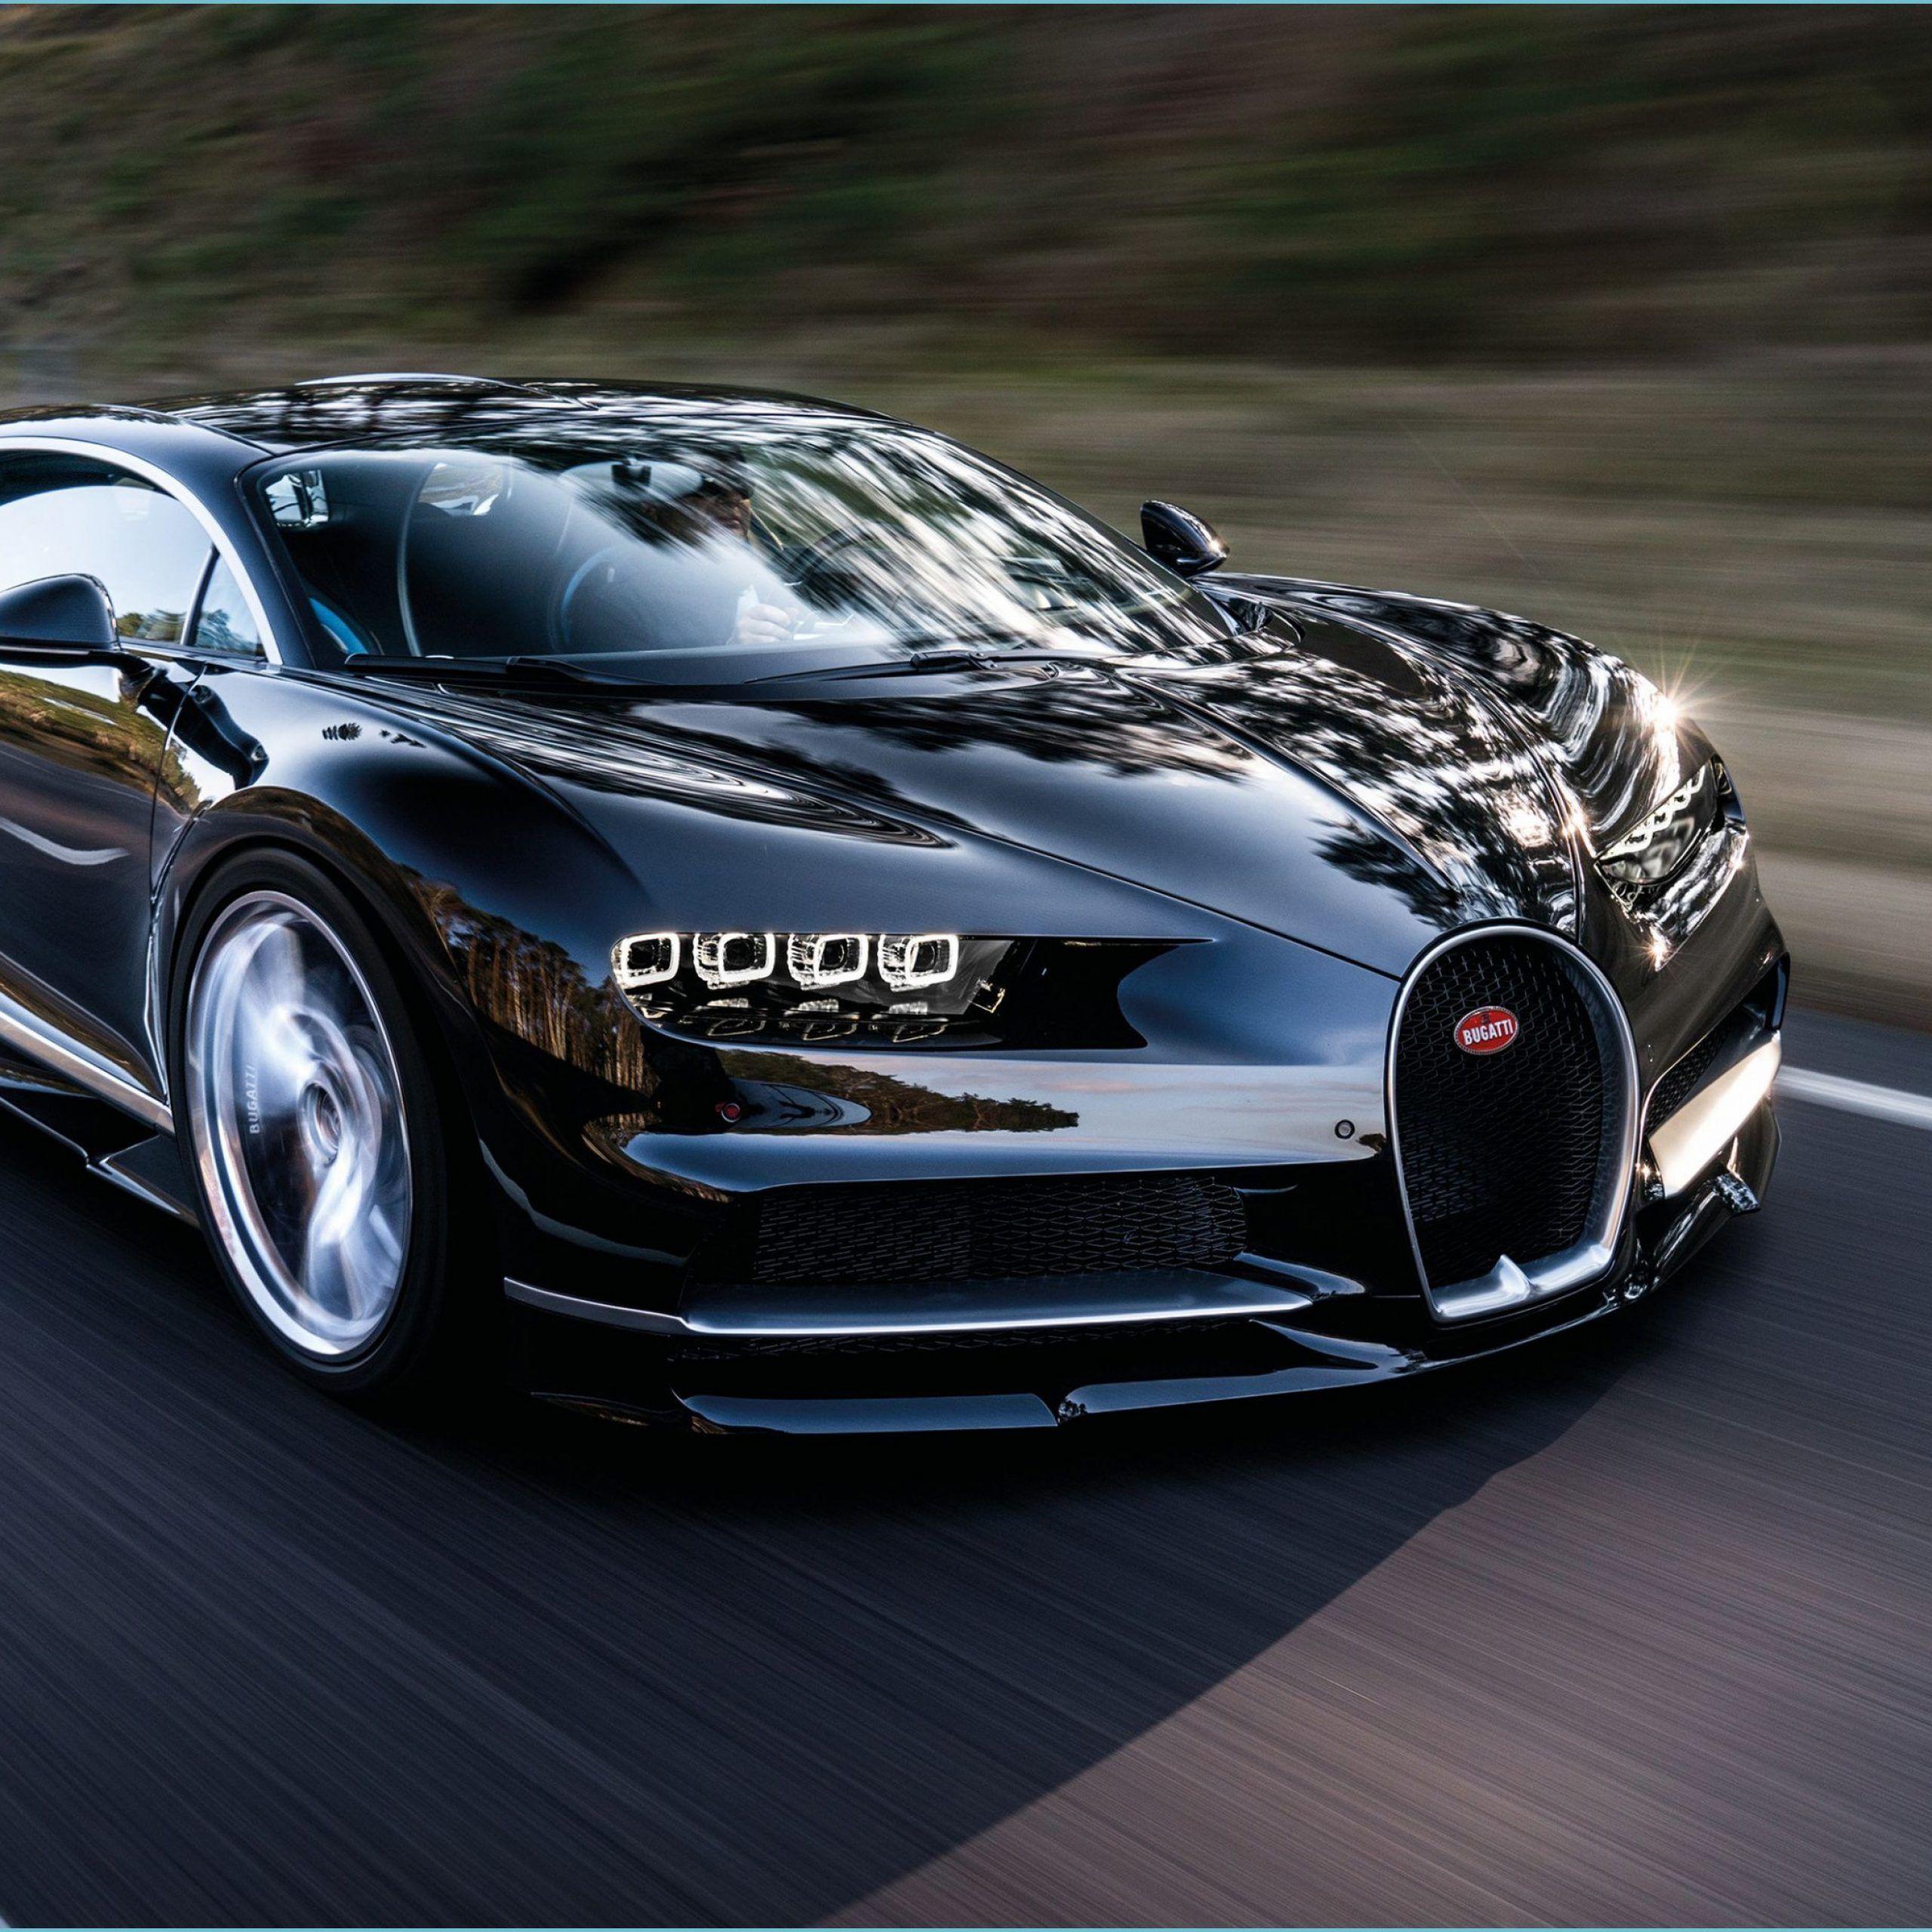 How Bugatti Wallpaper Is Going To Change Your Business Strategies Bugatti Wallpaper Super Cars Bugatti Sports Cars Luxury